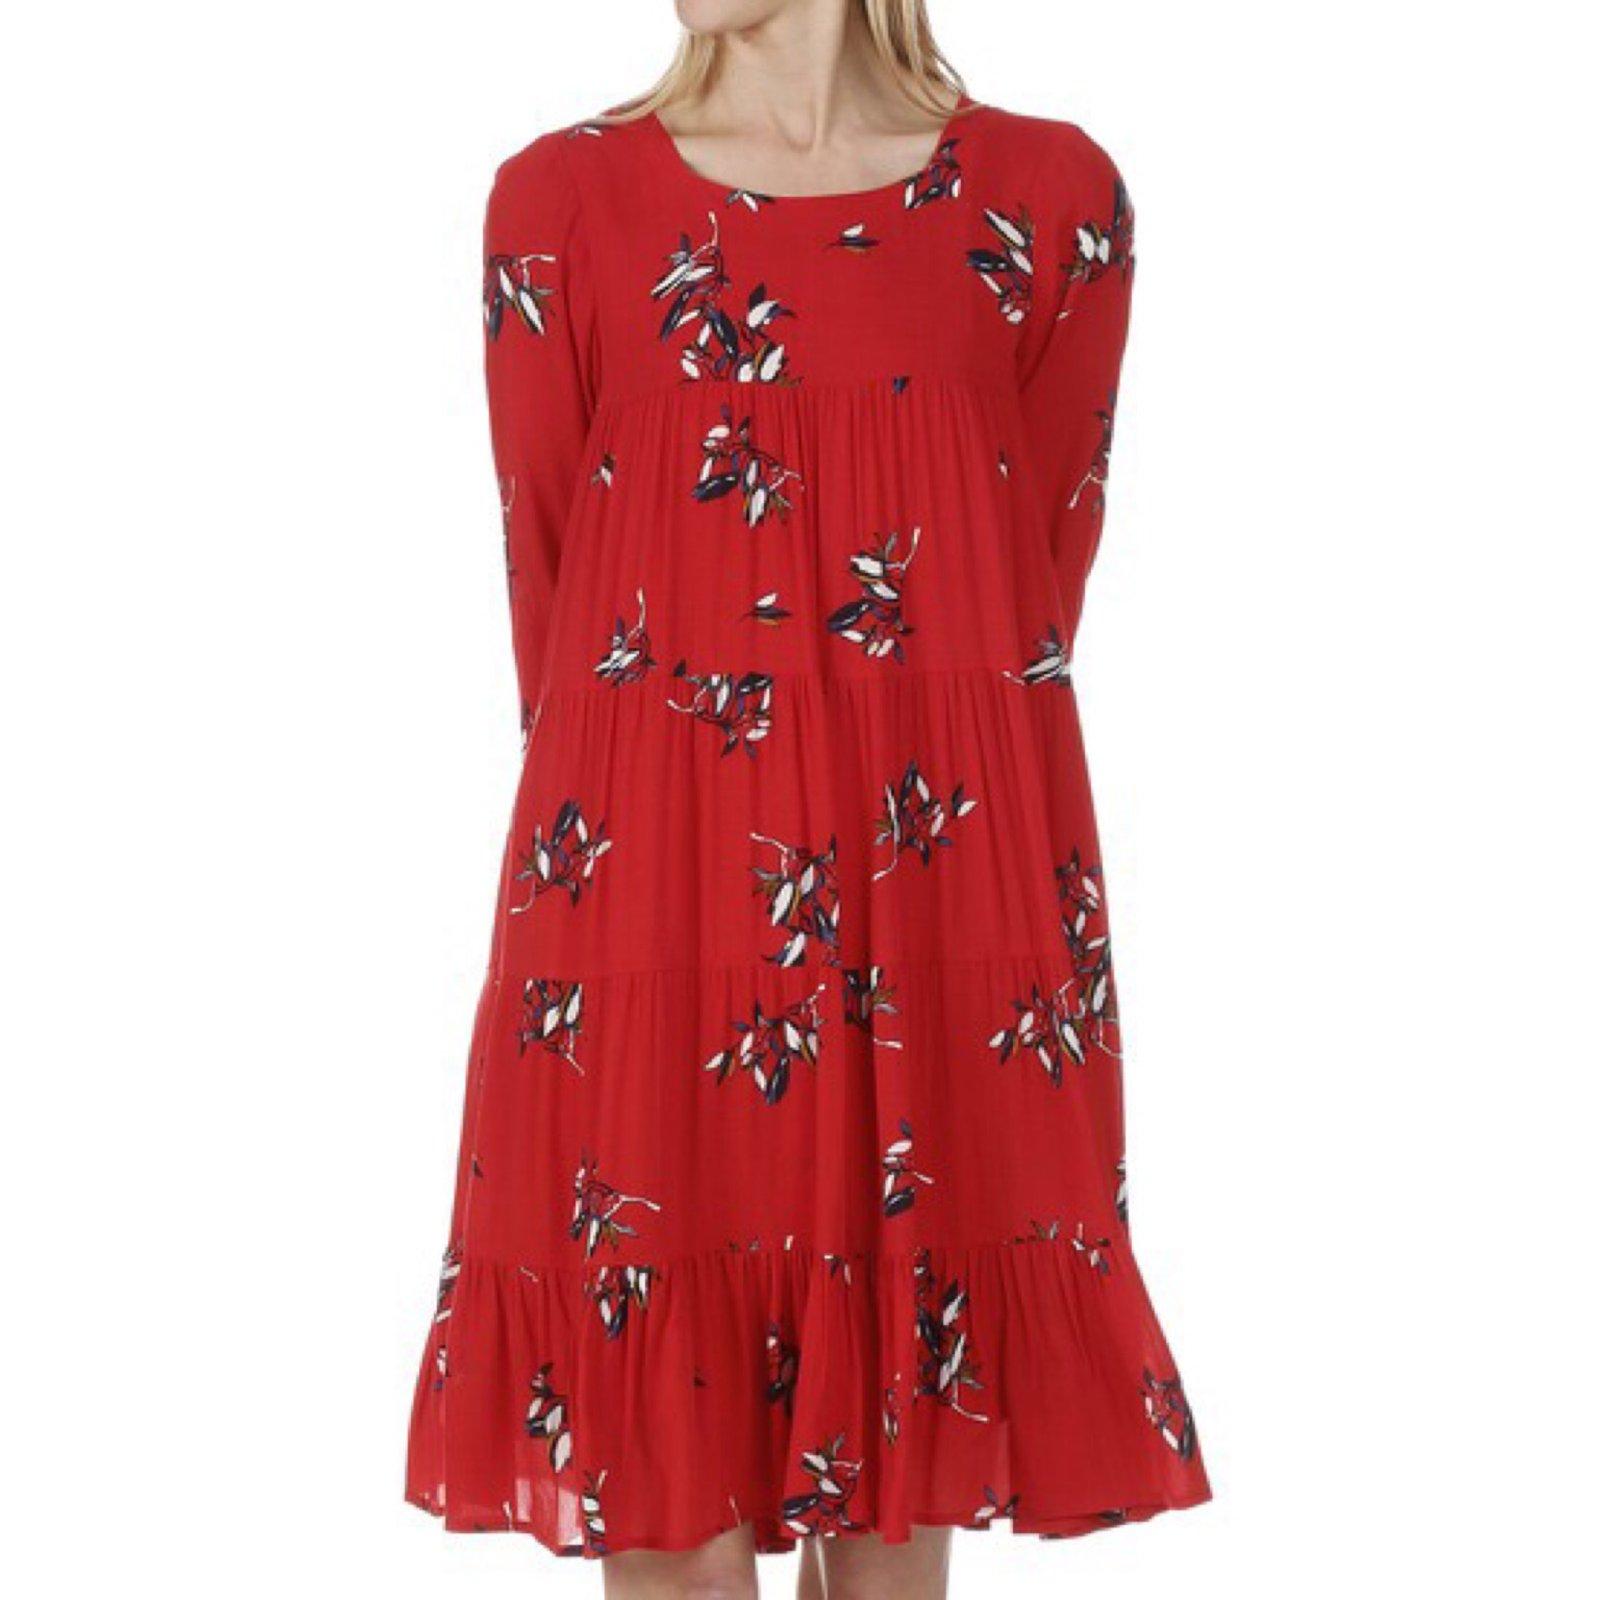 Robes Caroll Robe Viscose Autre Ref 76691 Joli Closet